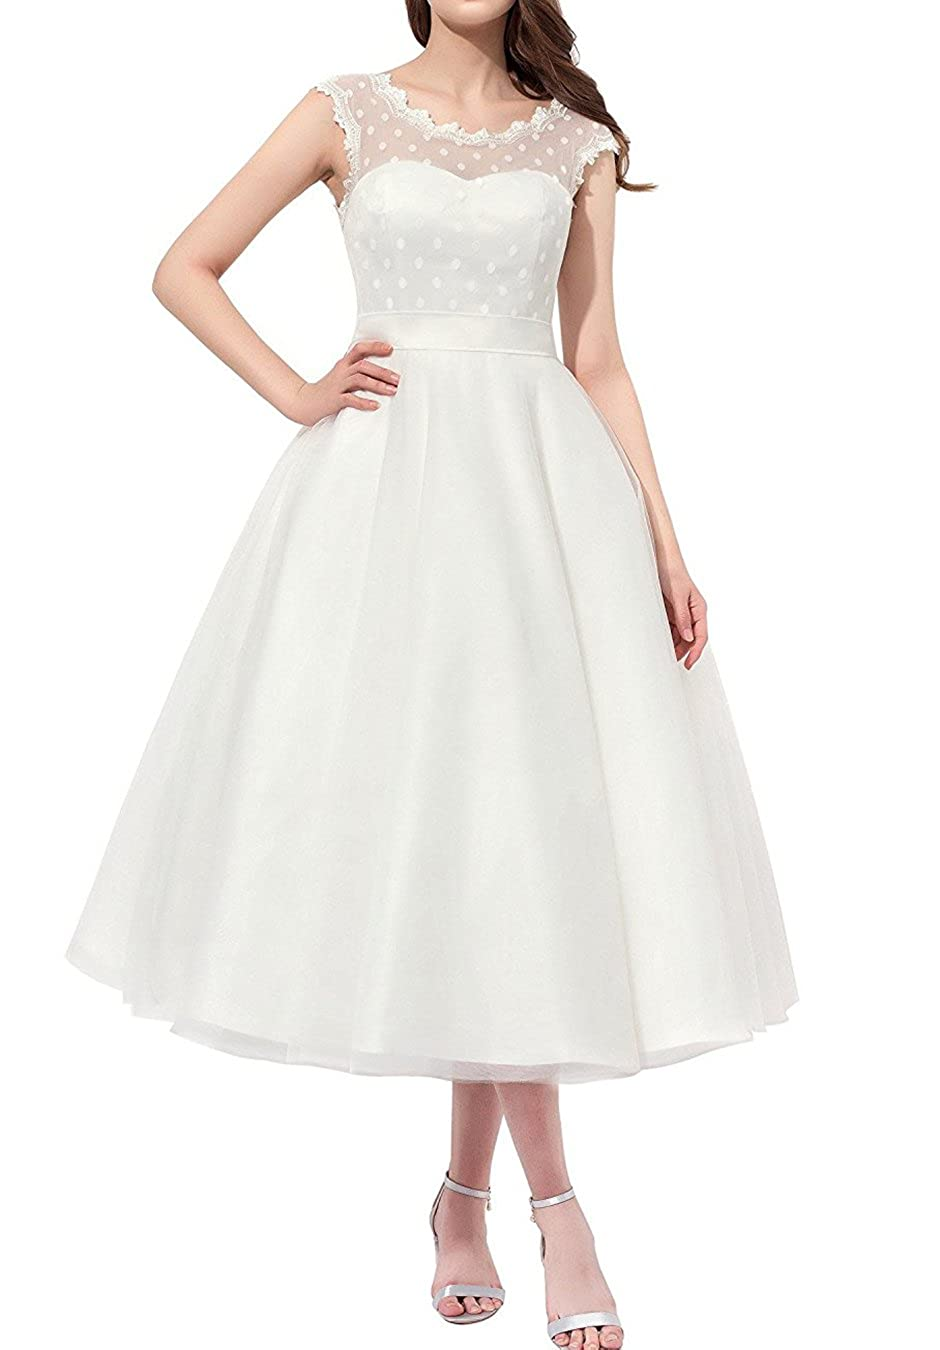 Women Vintage 1950s Tea Length Little Polka Dots Tulle Wedding Dress